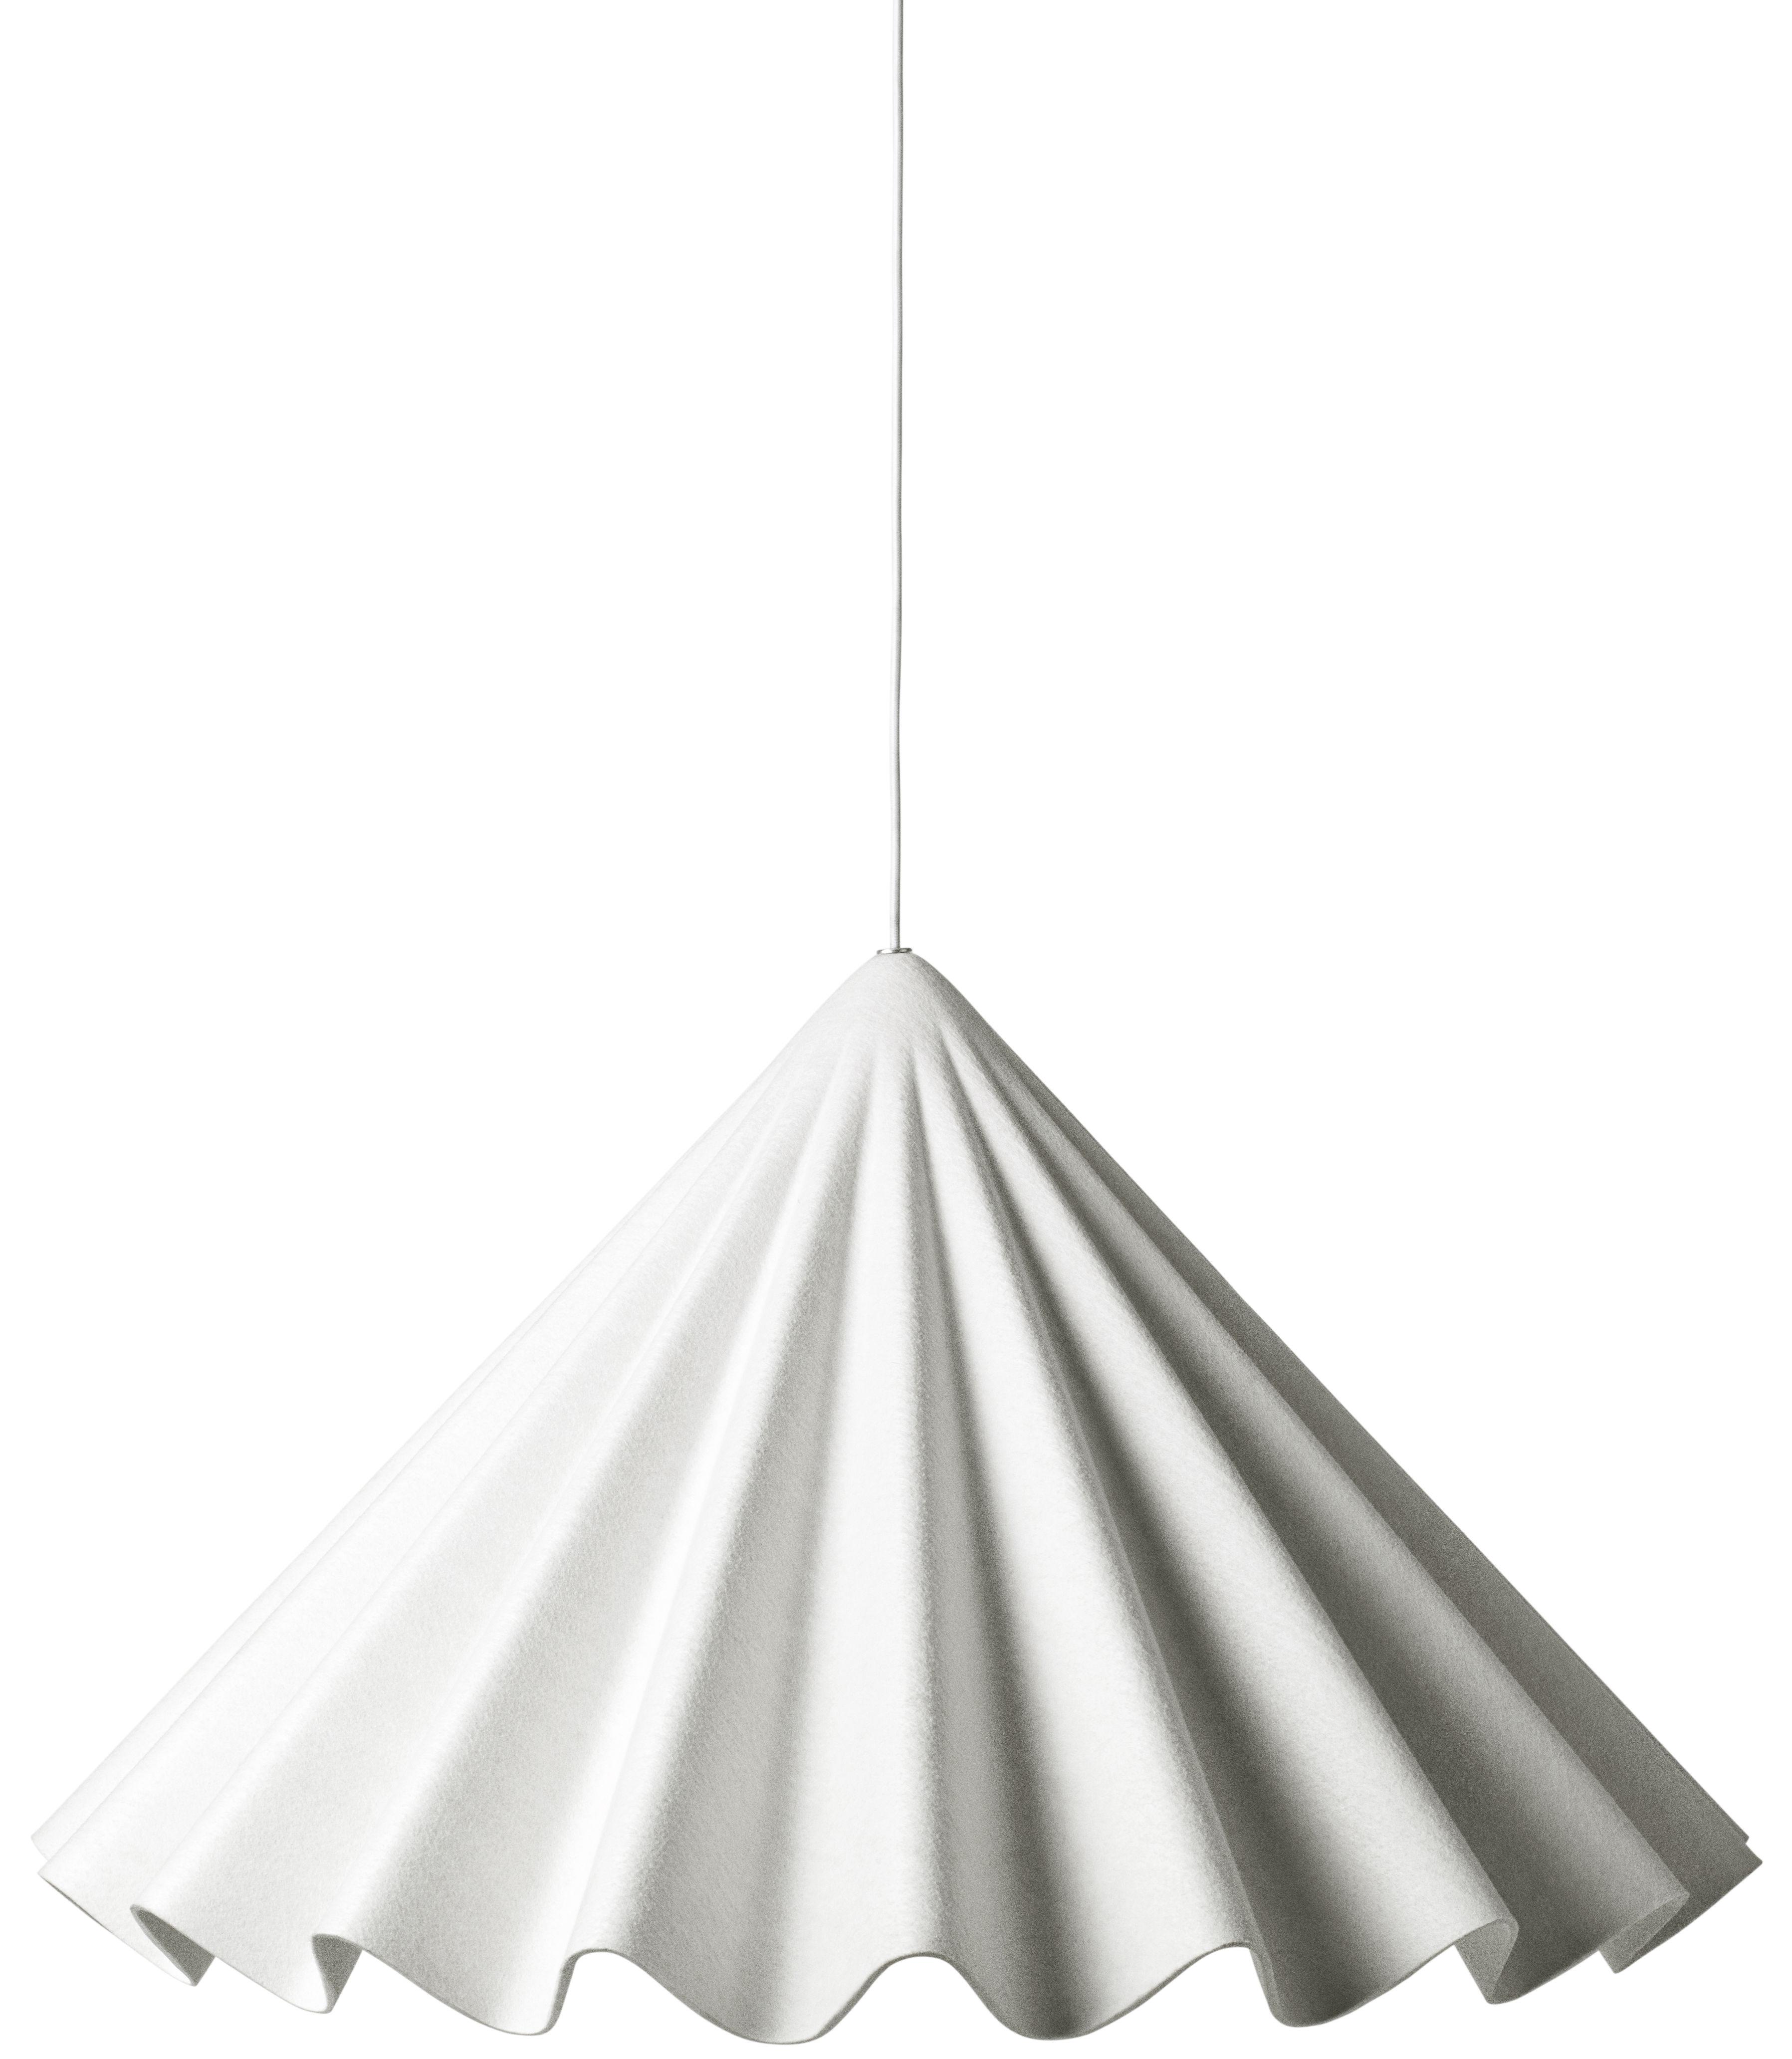 Illuminazione - Lampadari - Sospensione Dancing - / Feltro - Ø 95 cm di Menu - Bianco sporco - Feltro